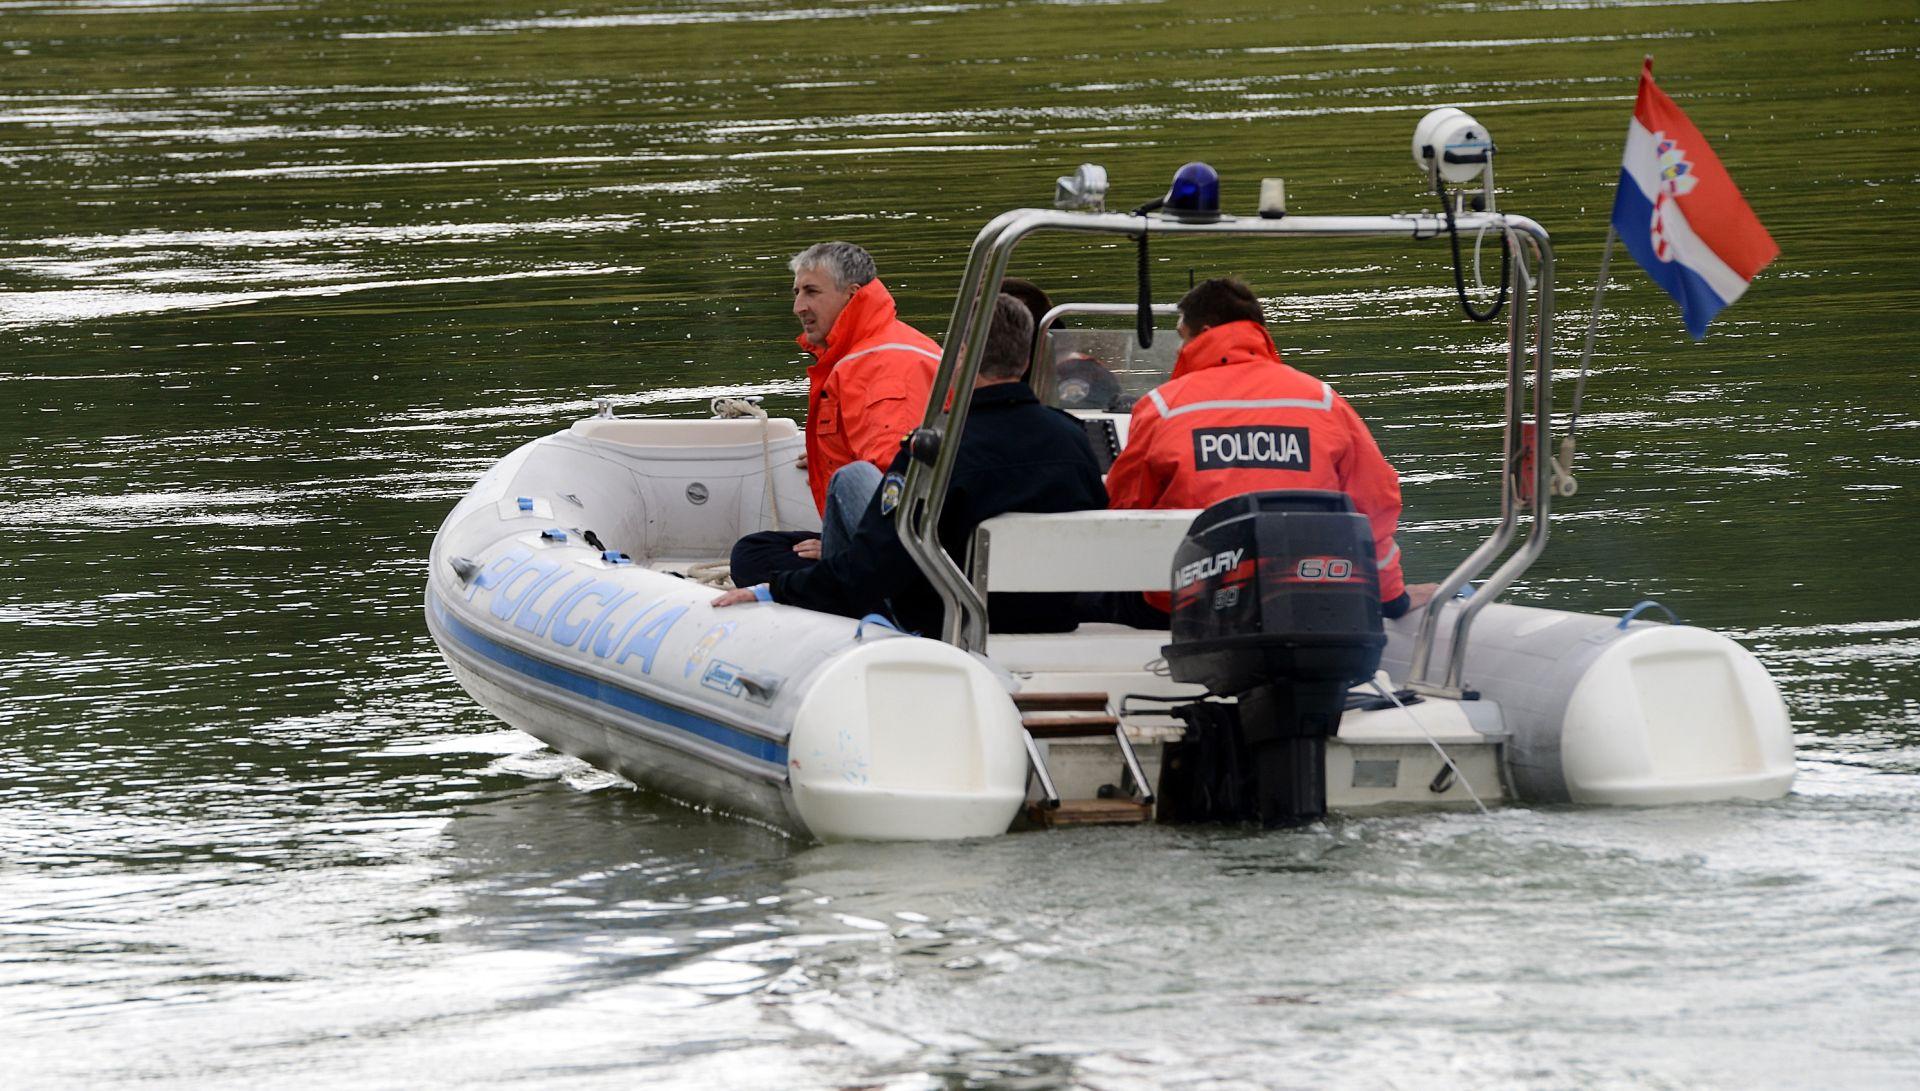 POTRAGA: Upali u kanal Drave, jedna osoba uspjela doći do obale, dvoje nestalih